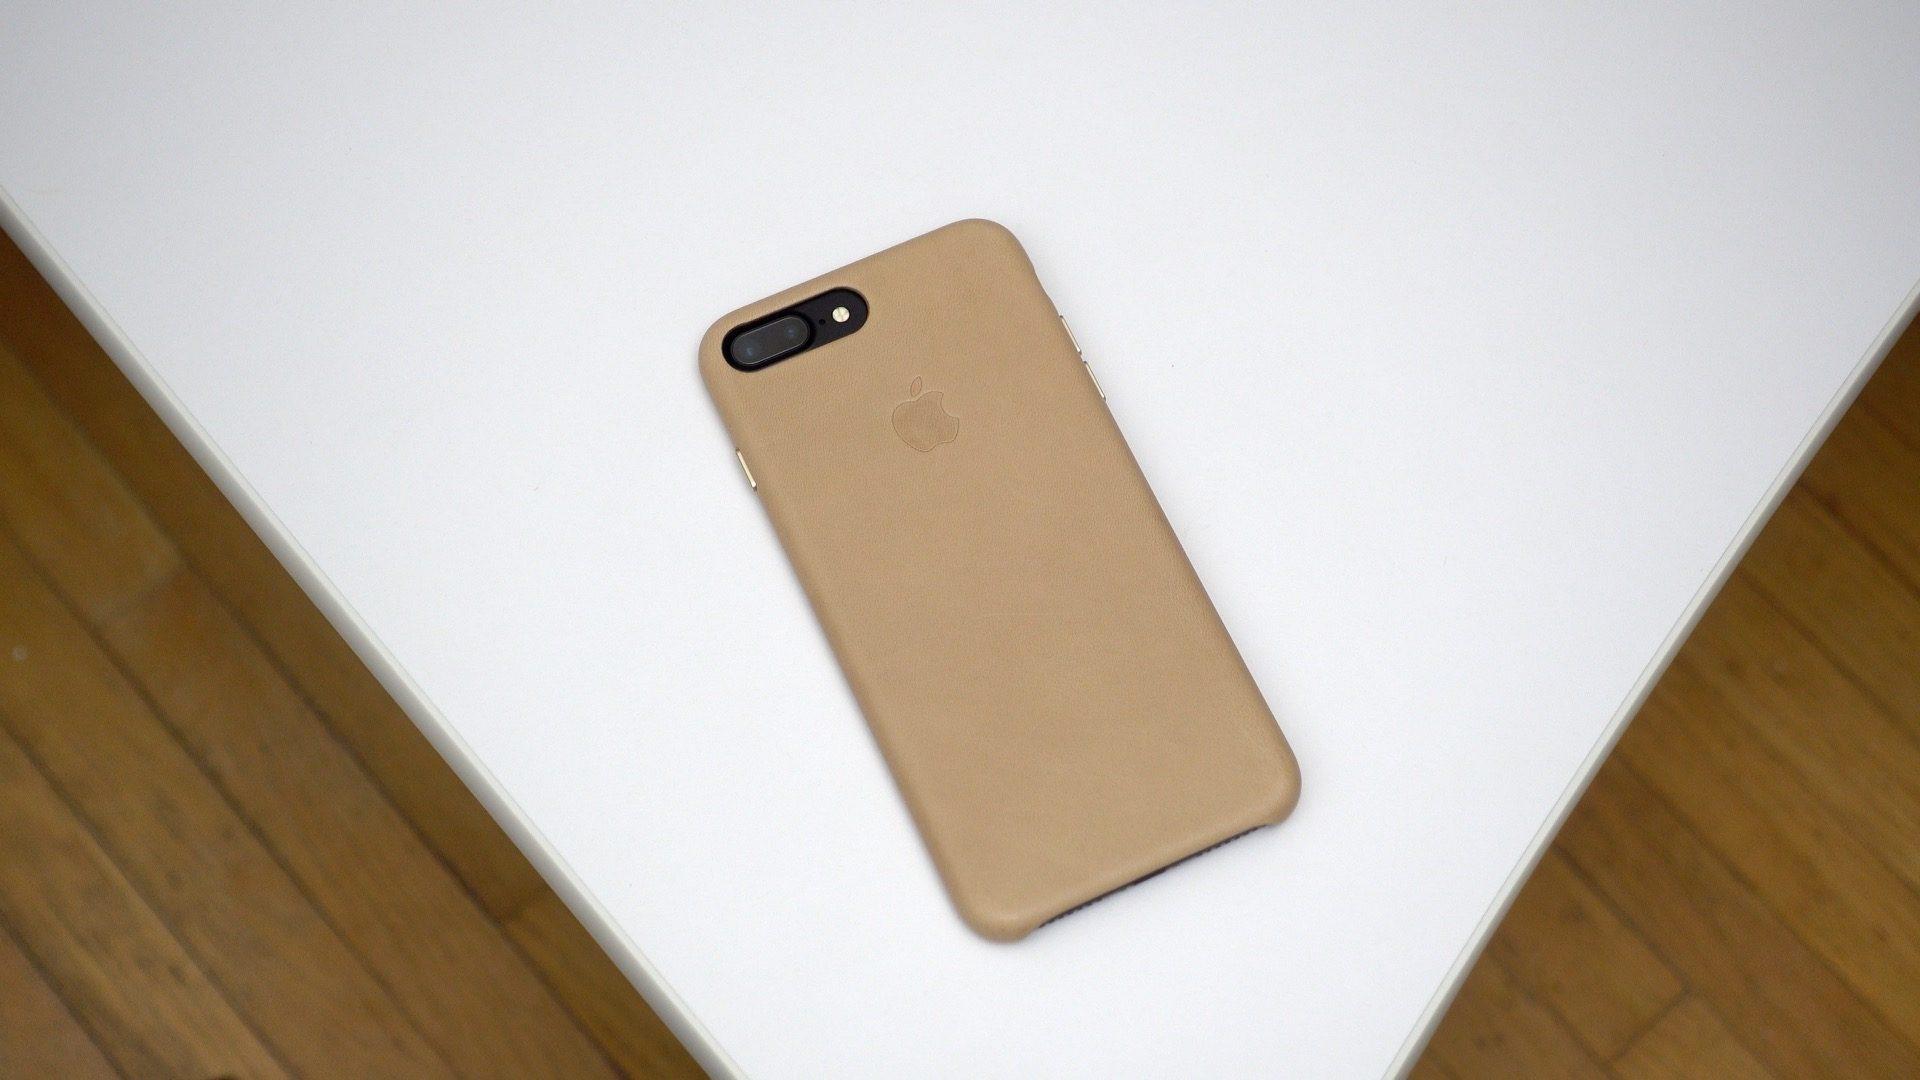 iphone-7-plus-leather-case-tan-09